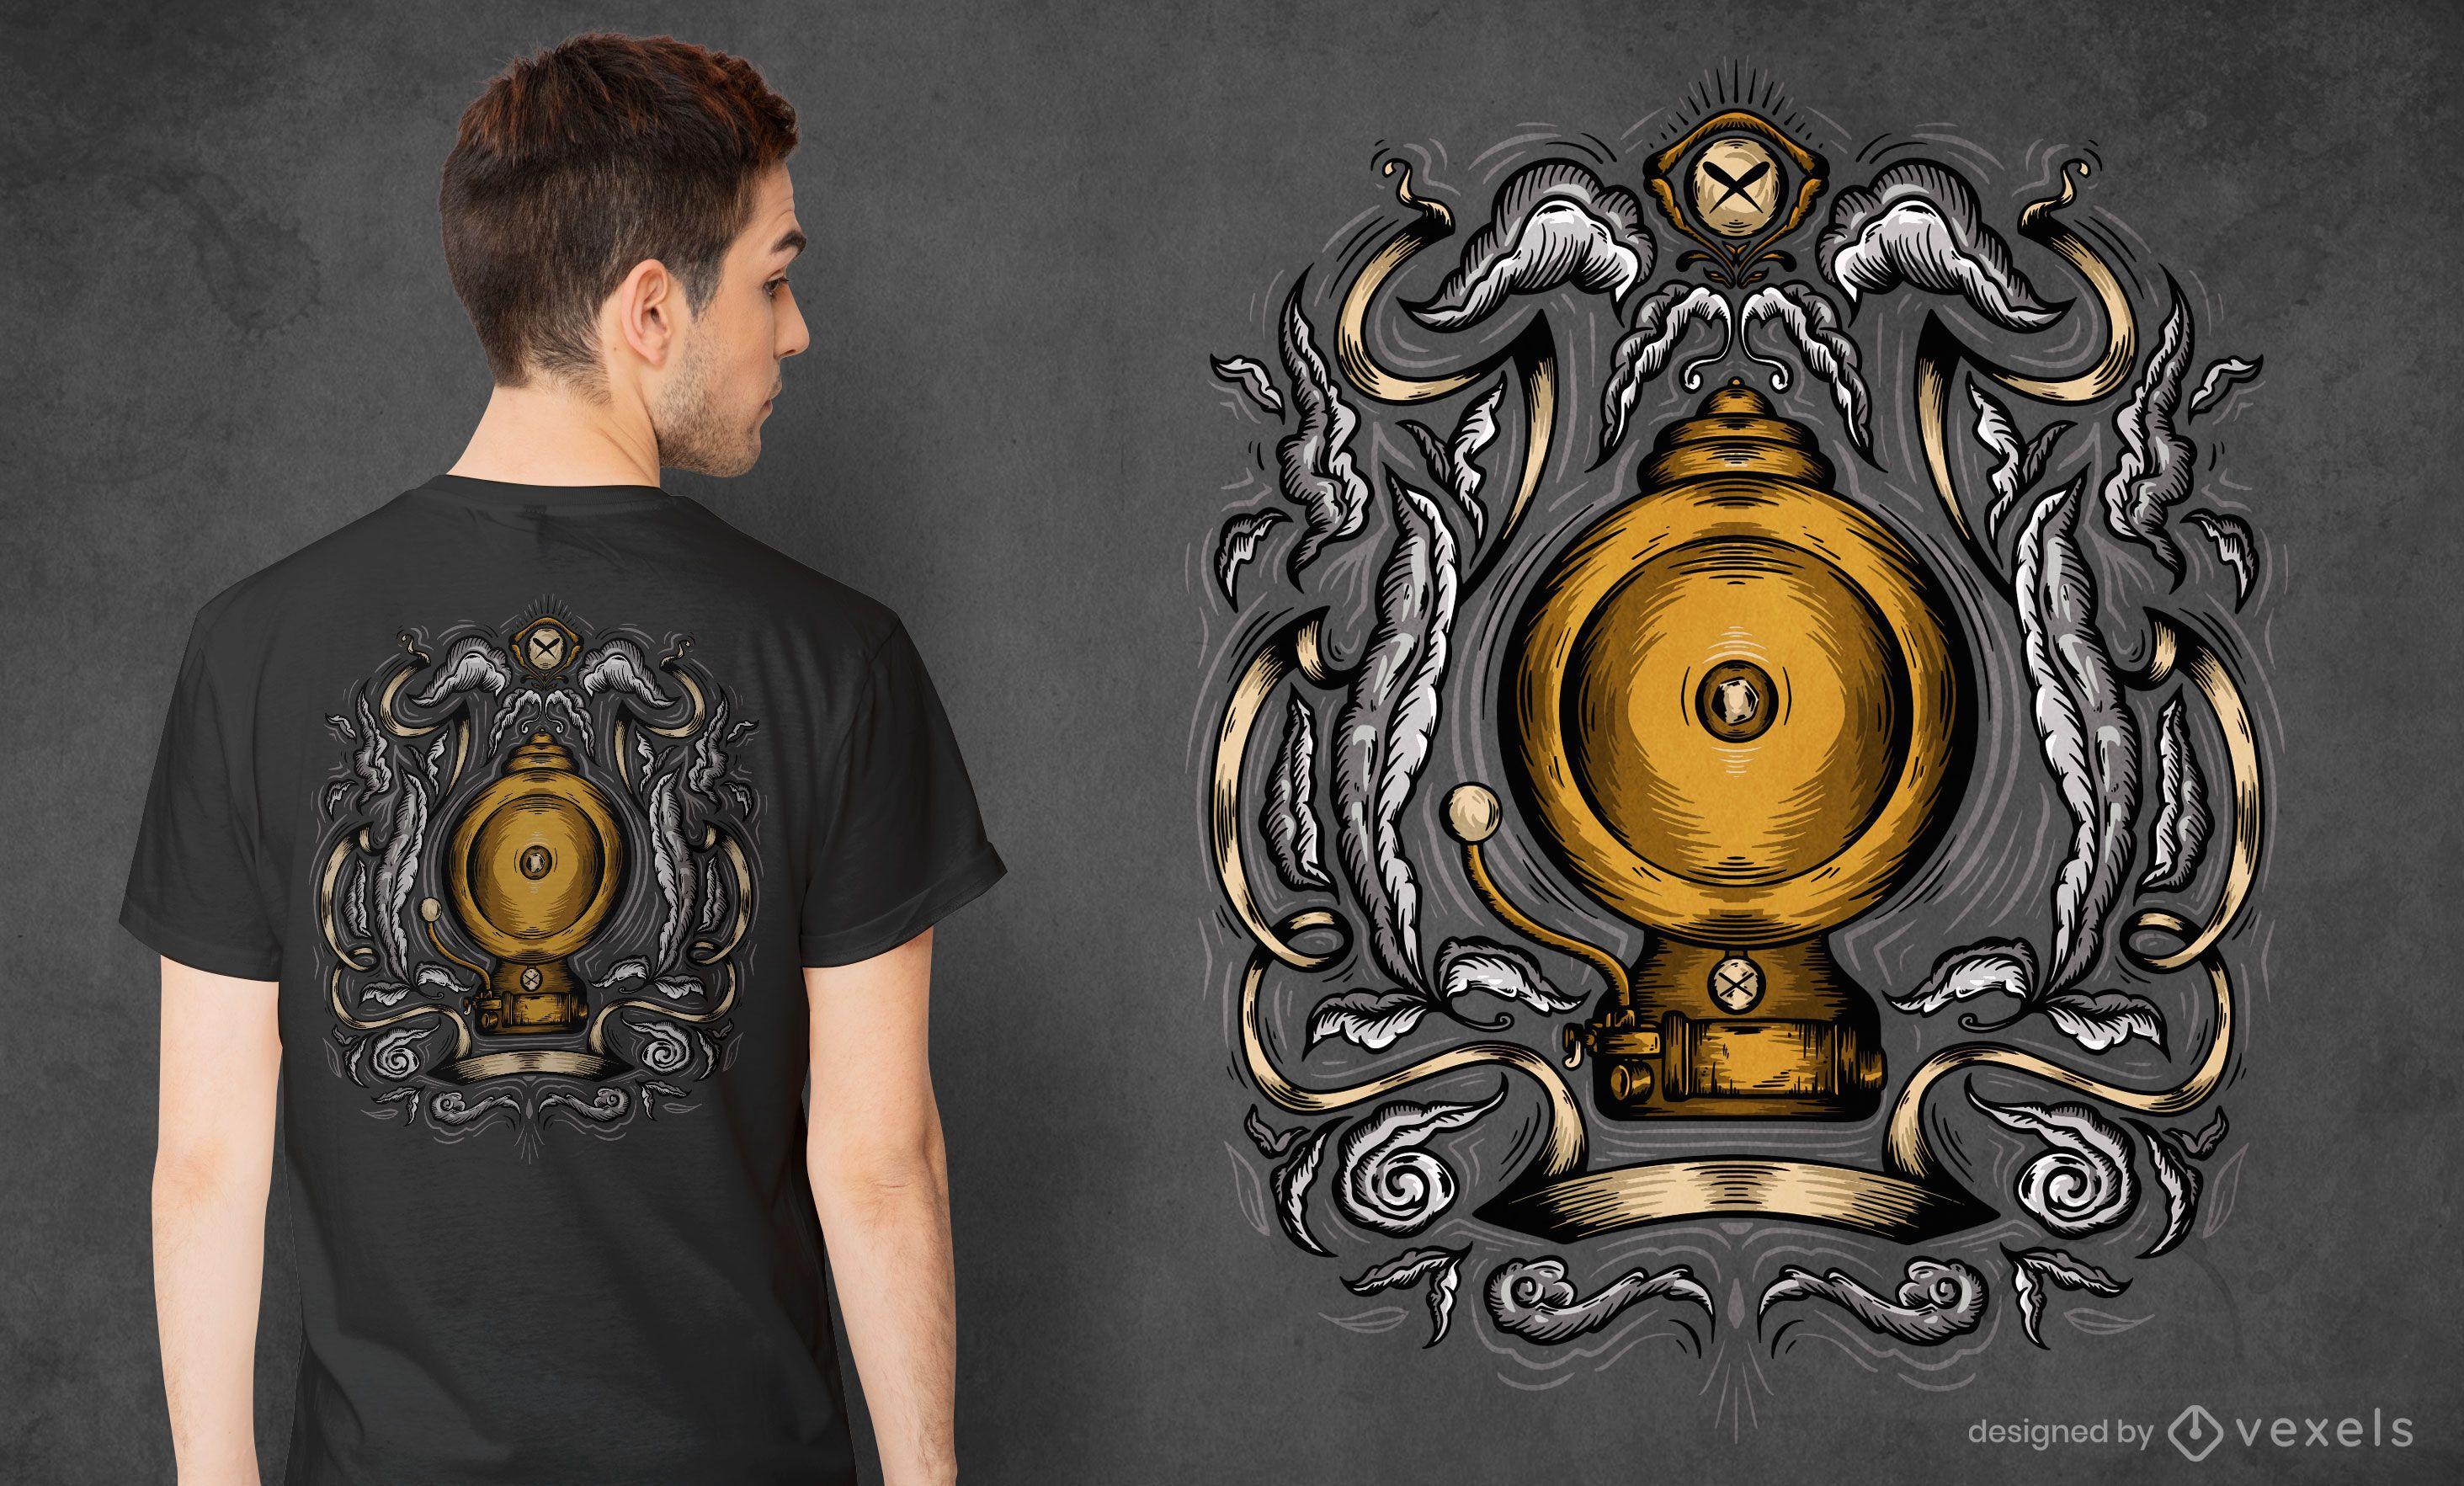 Diseño de camiseta de campana escolar.